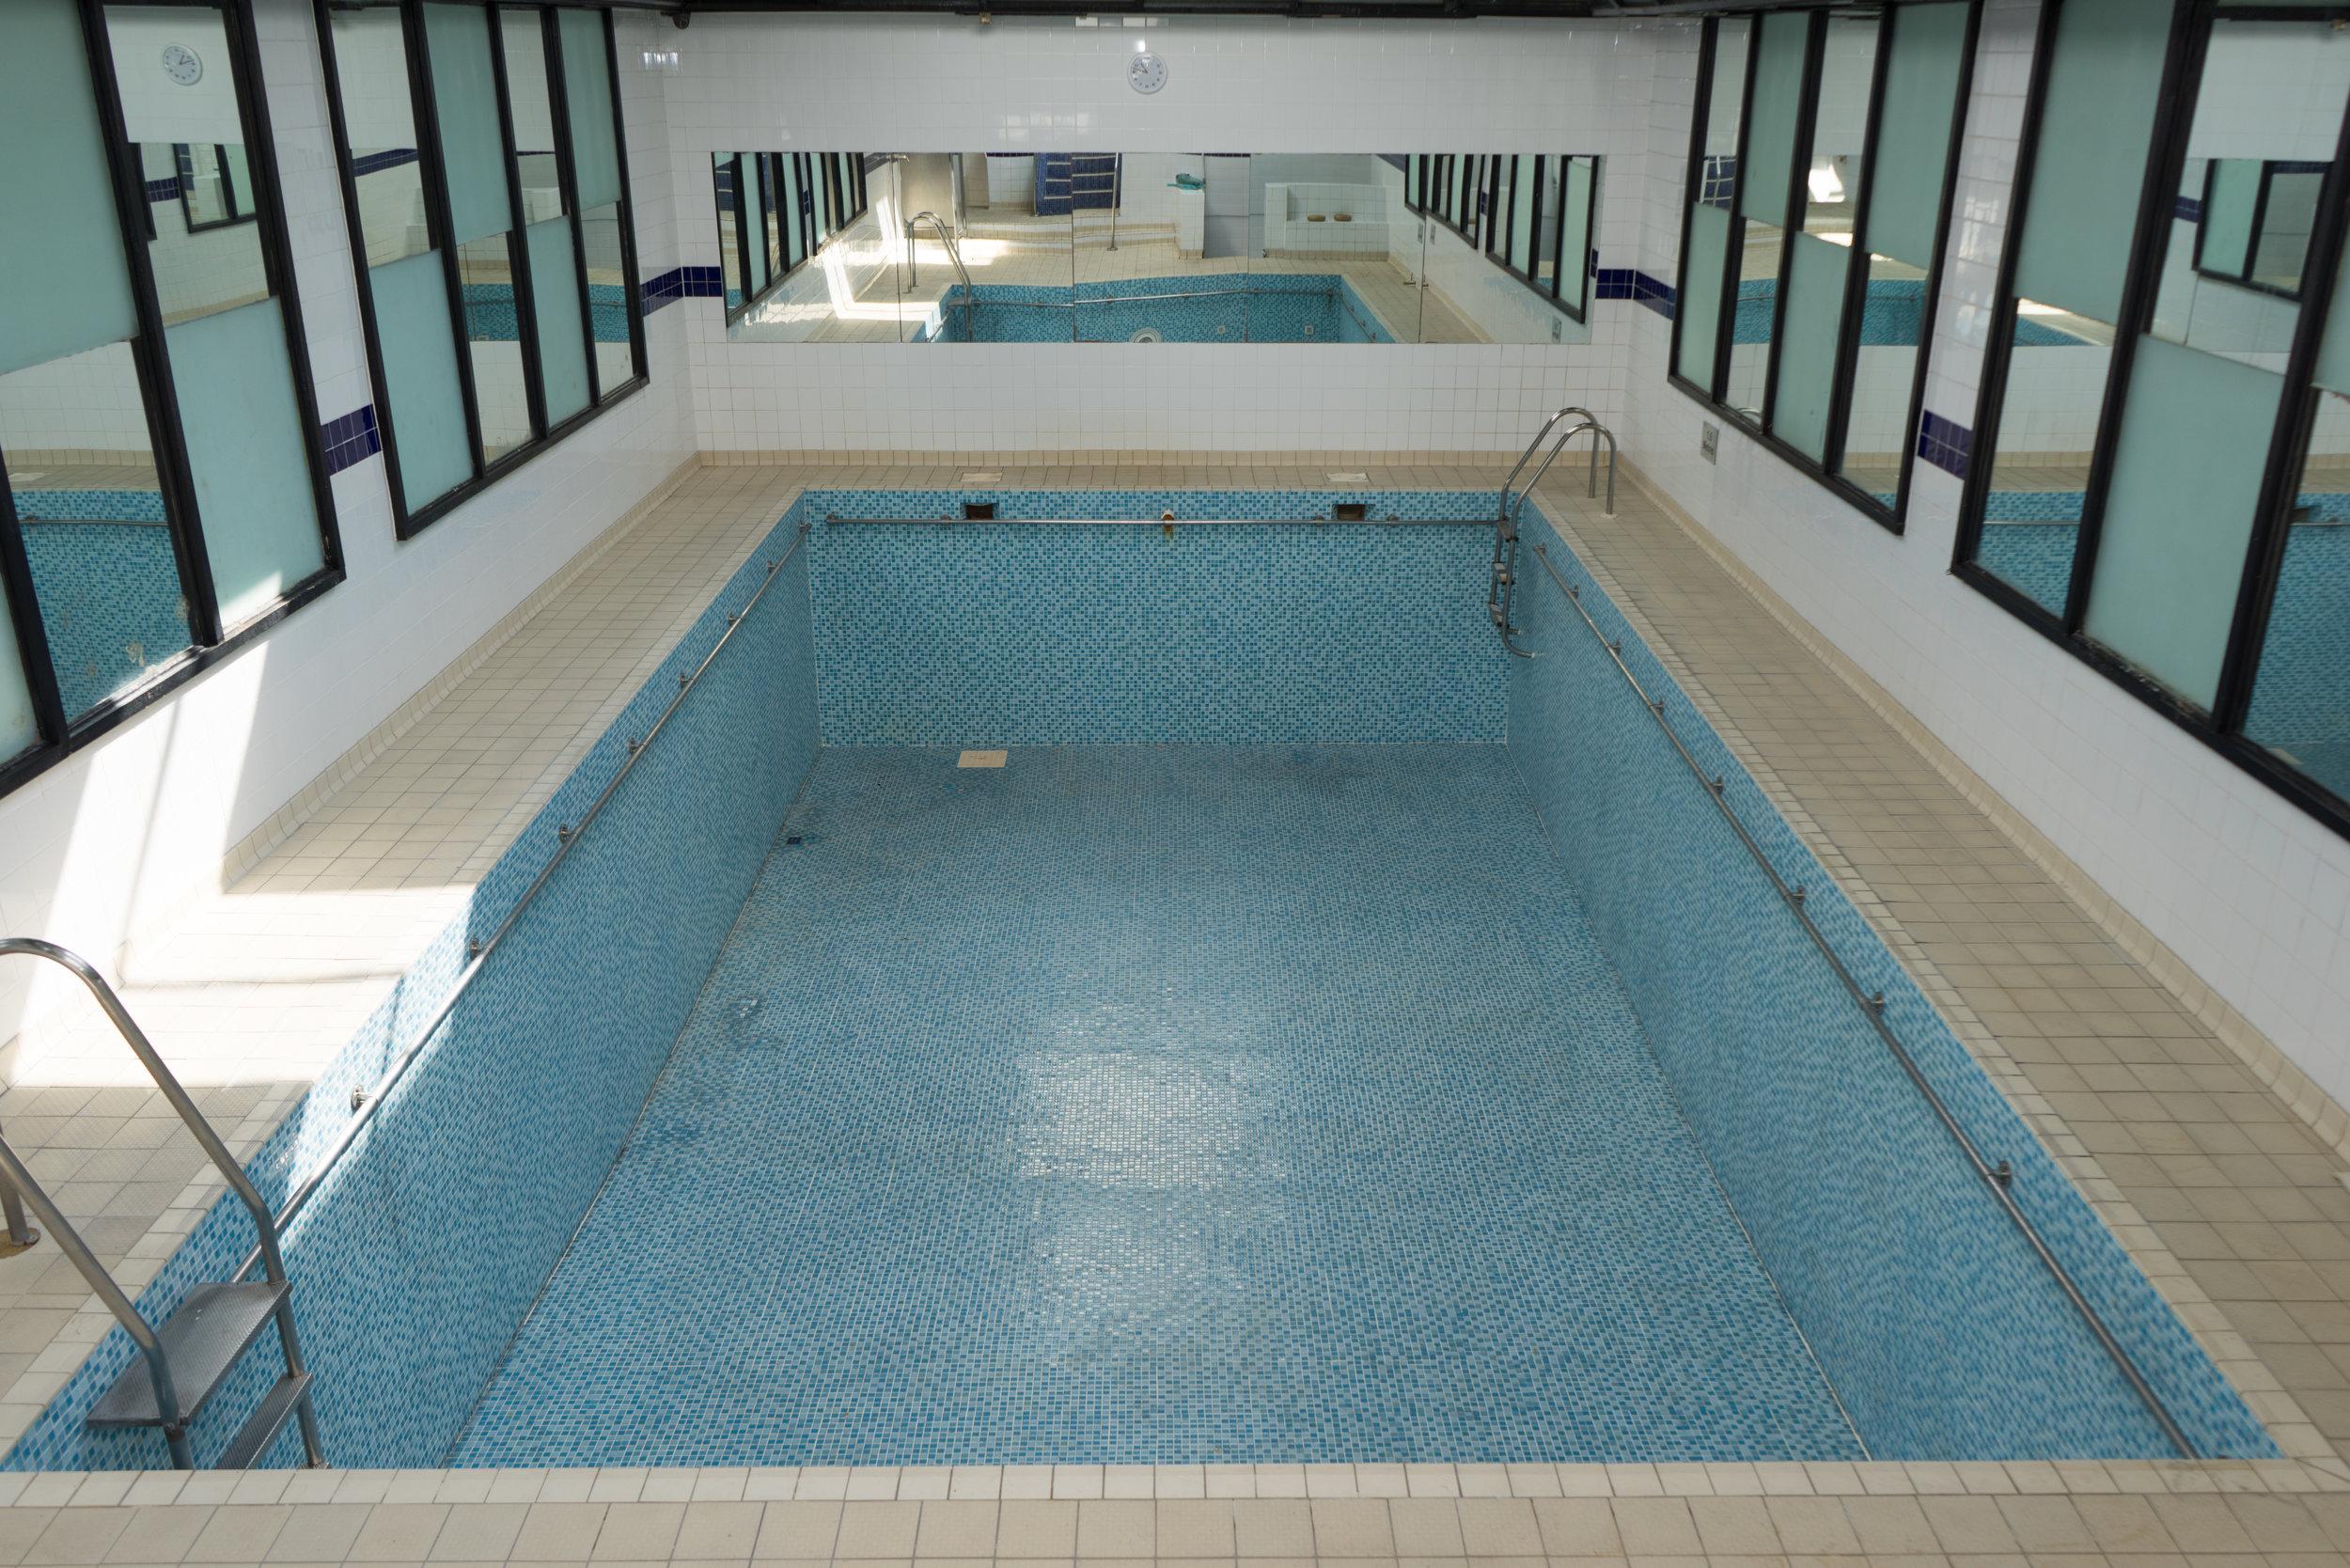 Swimming Pool - DSC04242 by Jonny Tanna.JPG